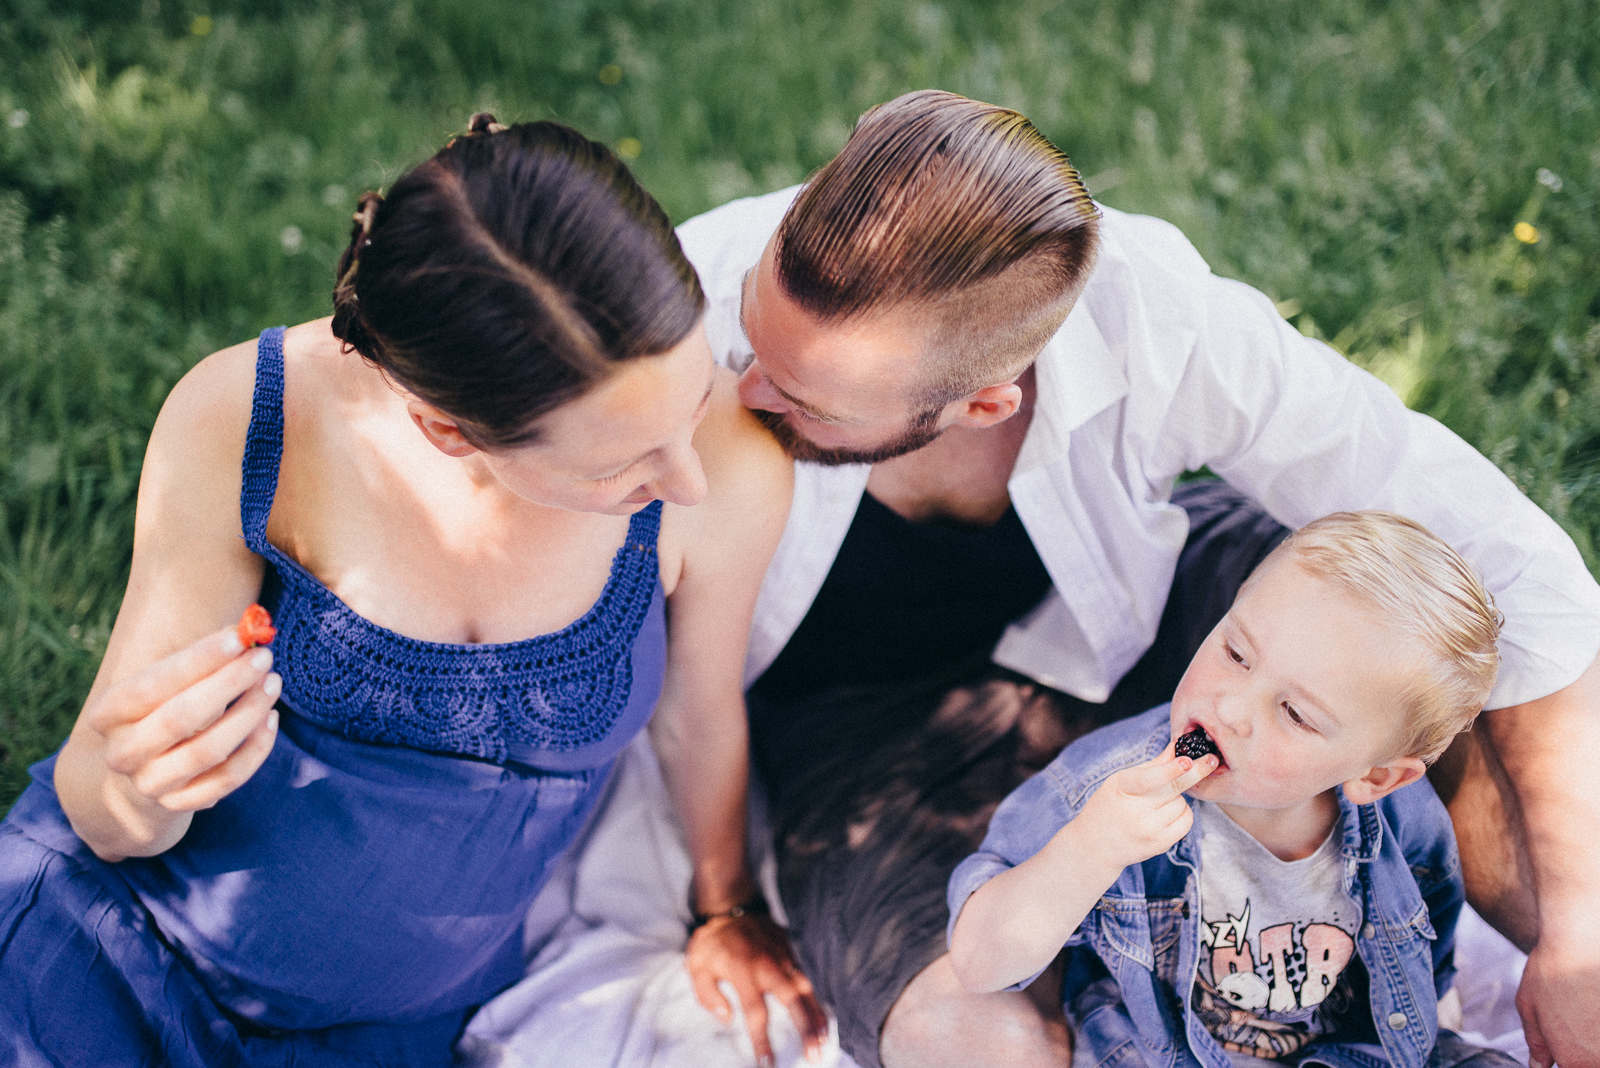 001-designparaplus-familie-fotografie-essen-familienshooting